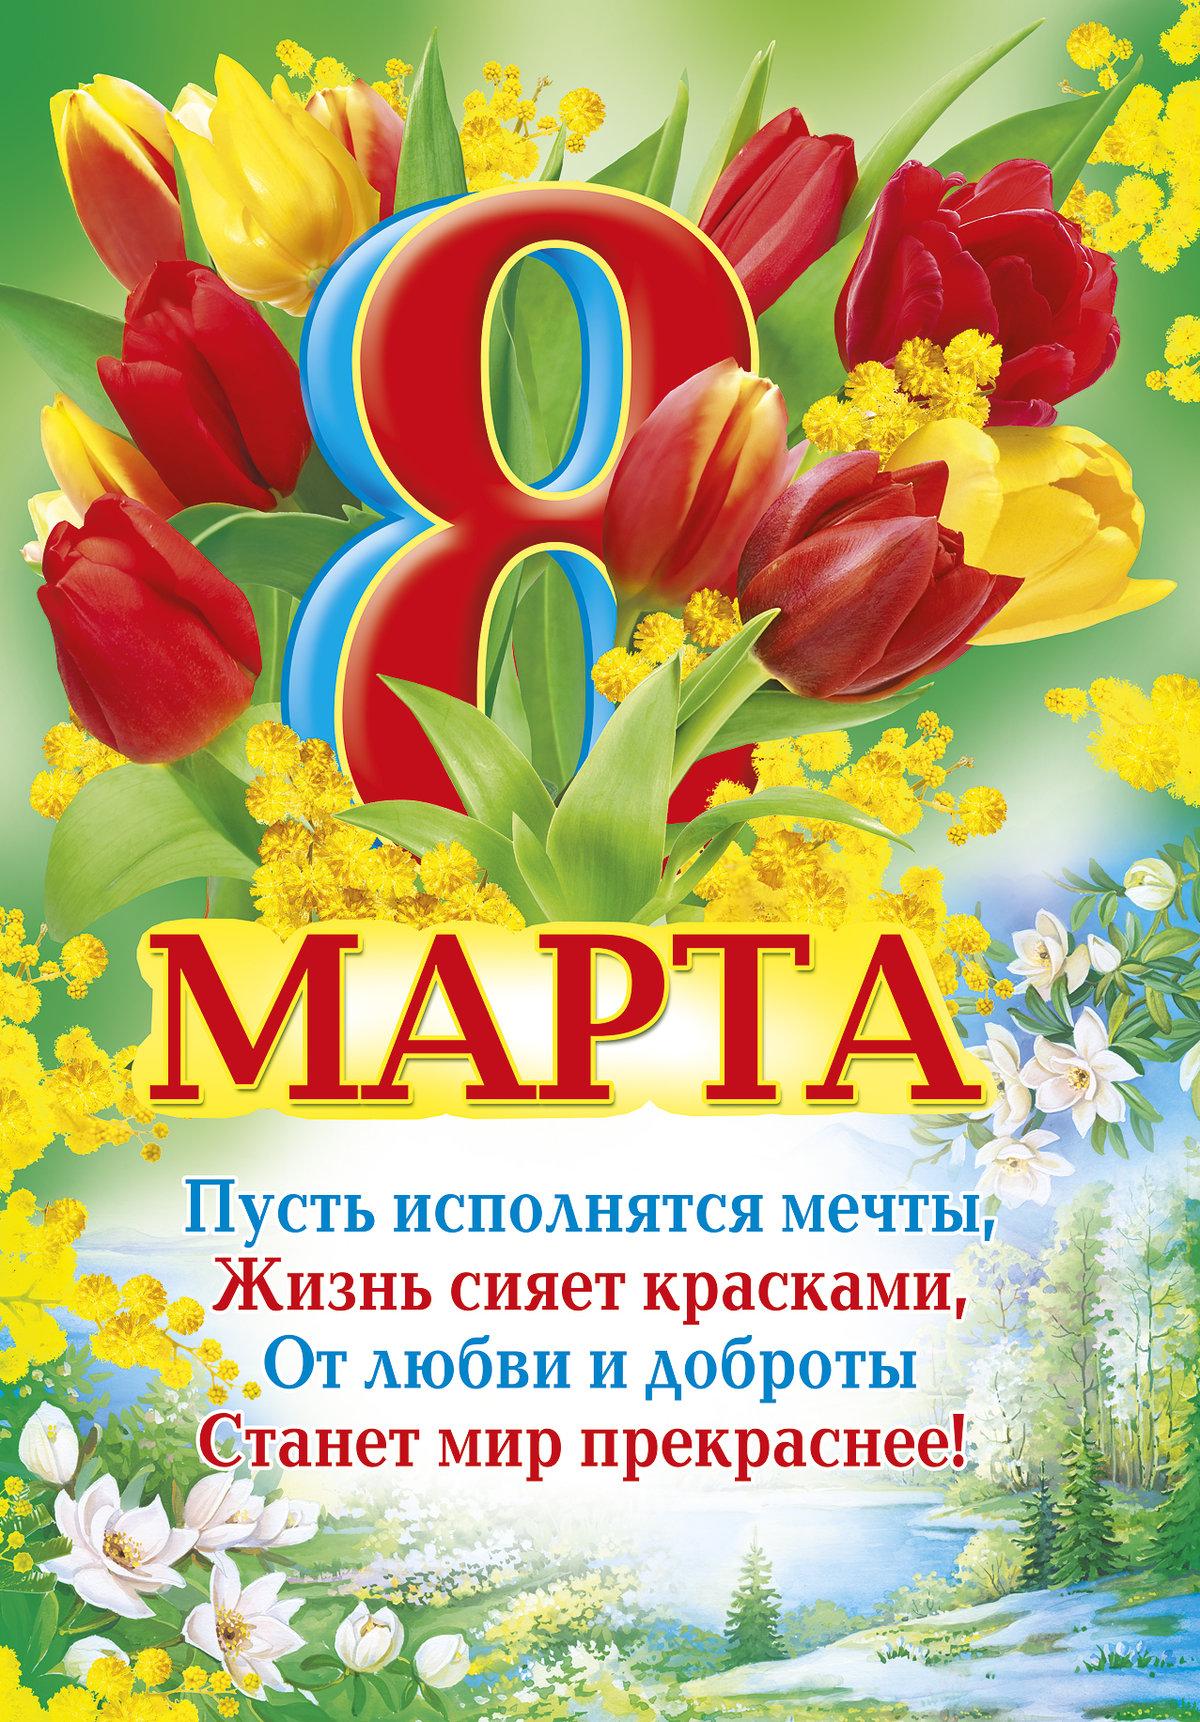 Февраля, картинки плакат к 8 марта